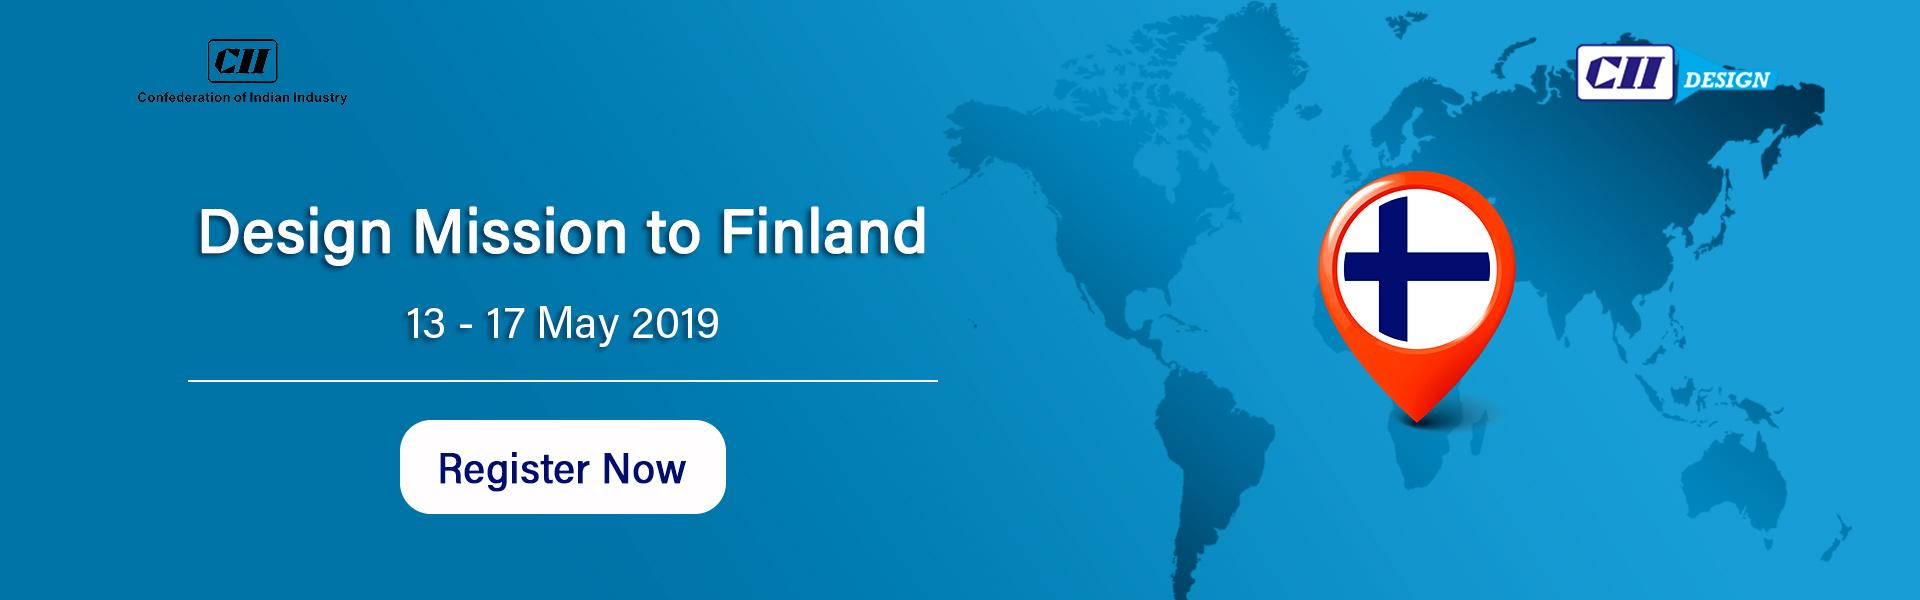 design-mission-to-finland